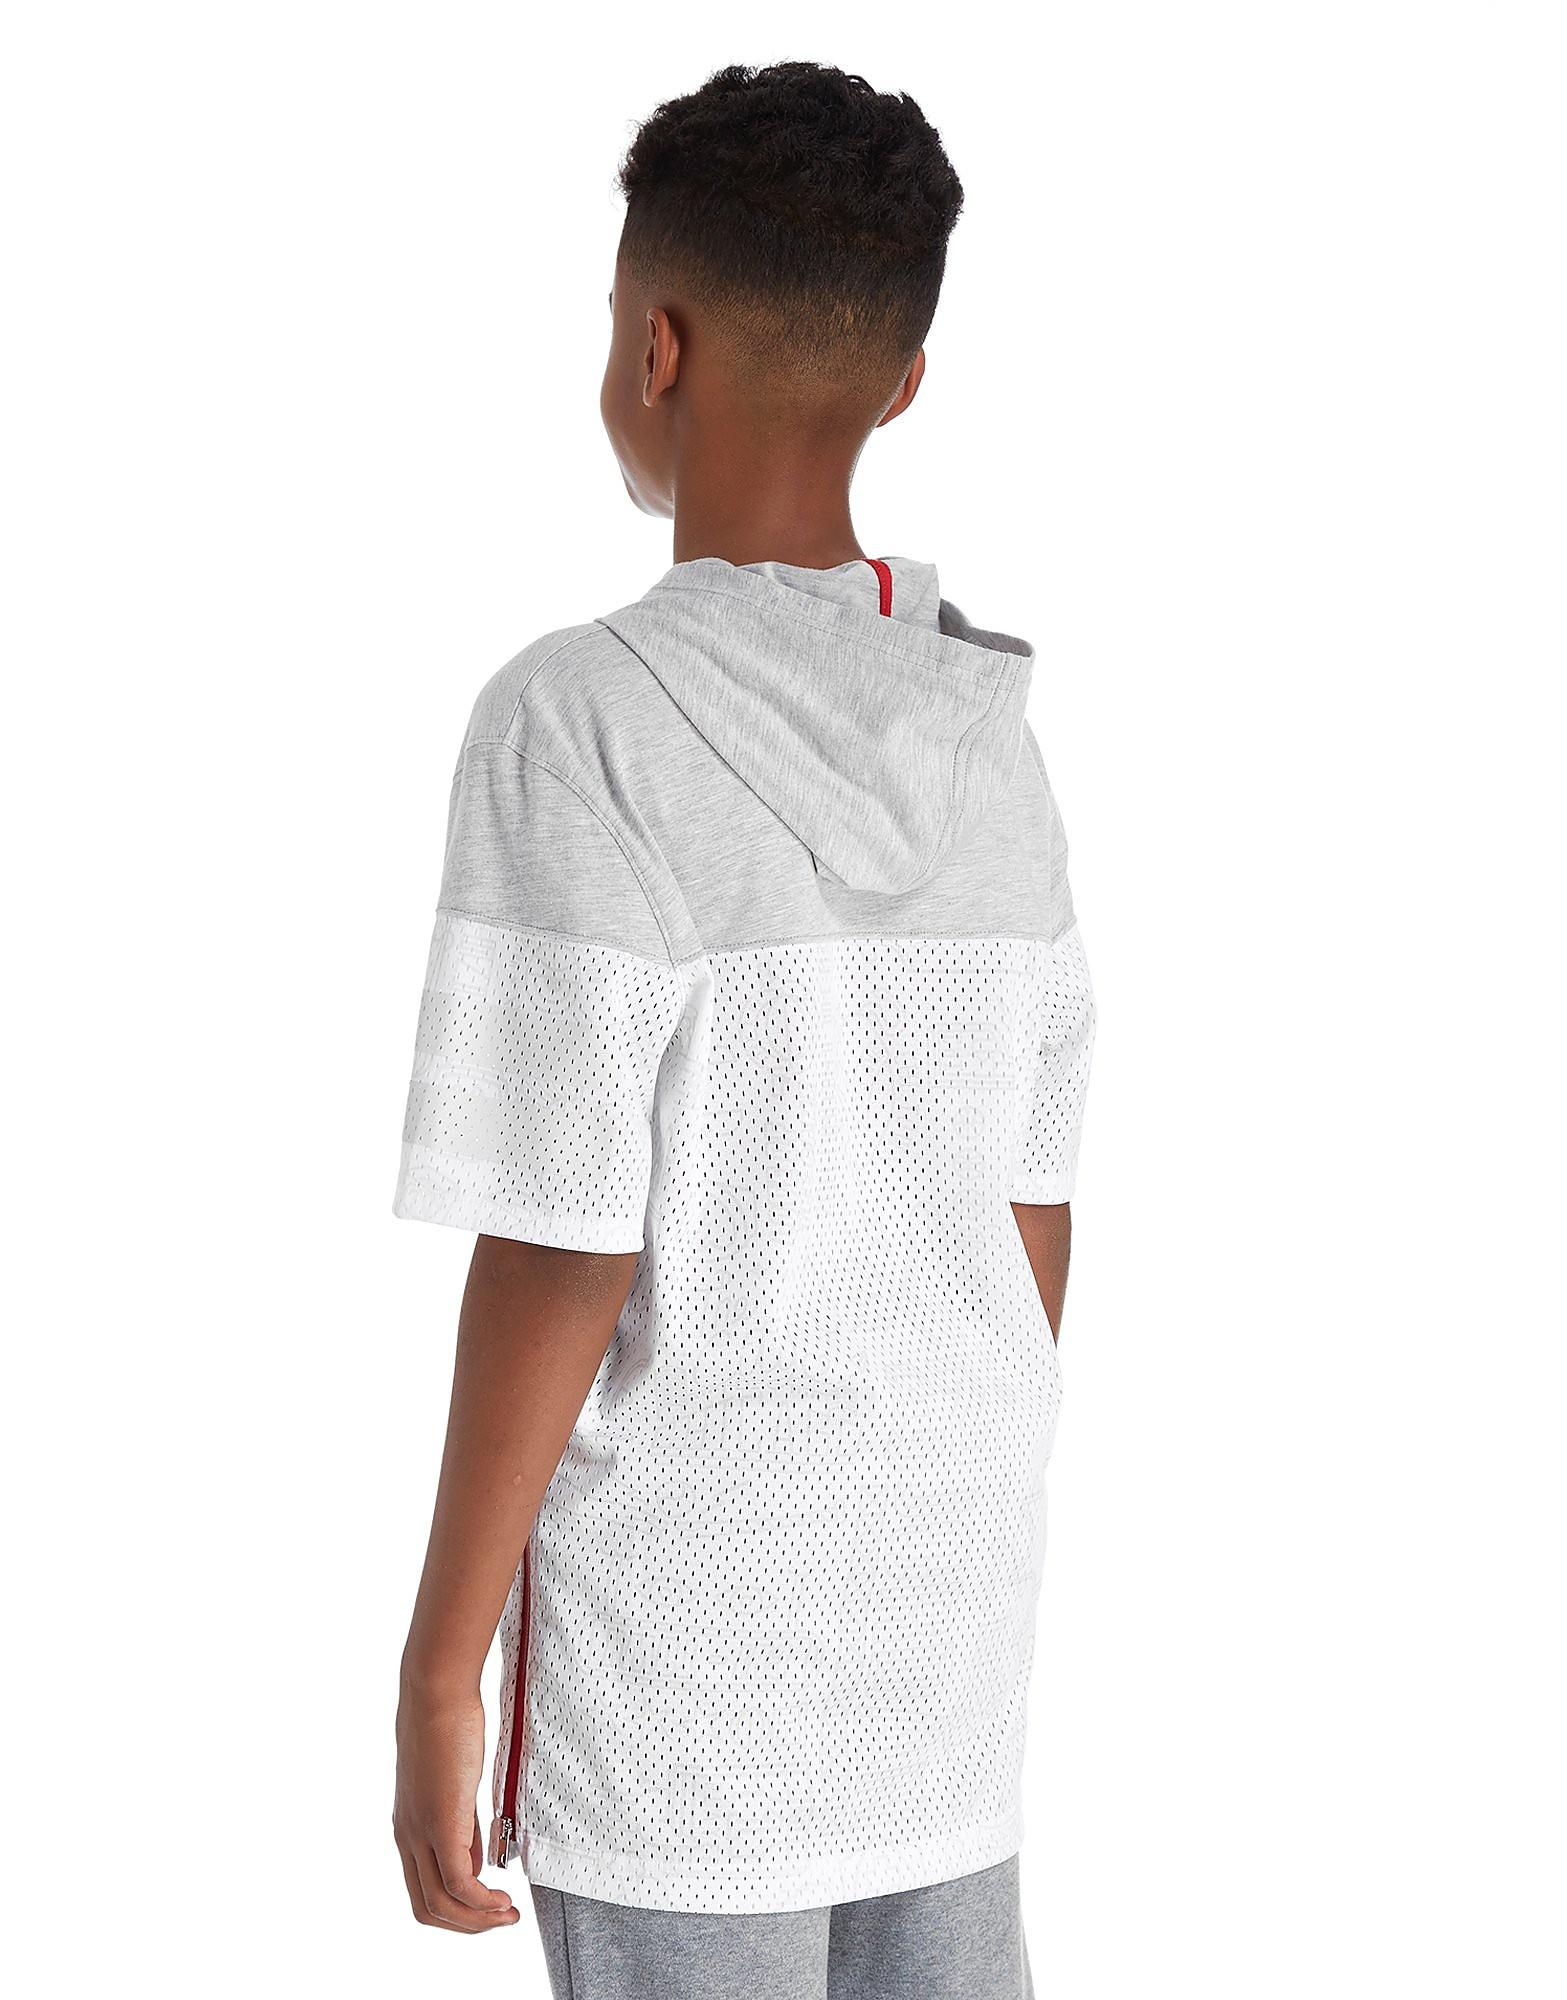 Jordan Mesh Hooded T-Shirt Junior